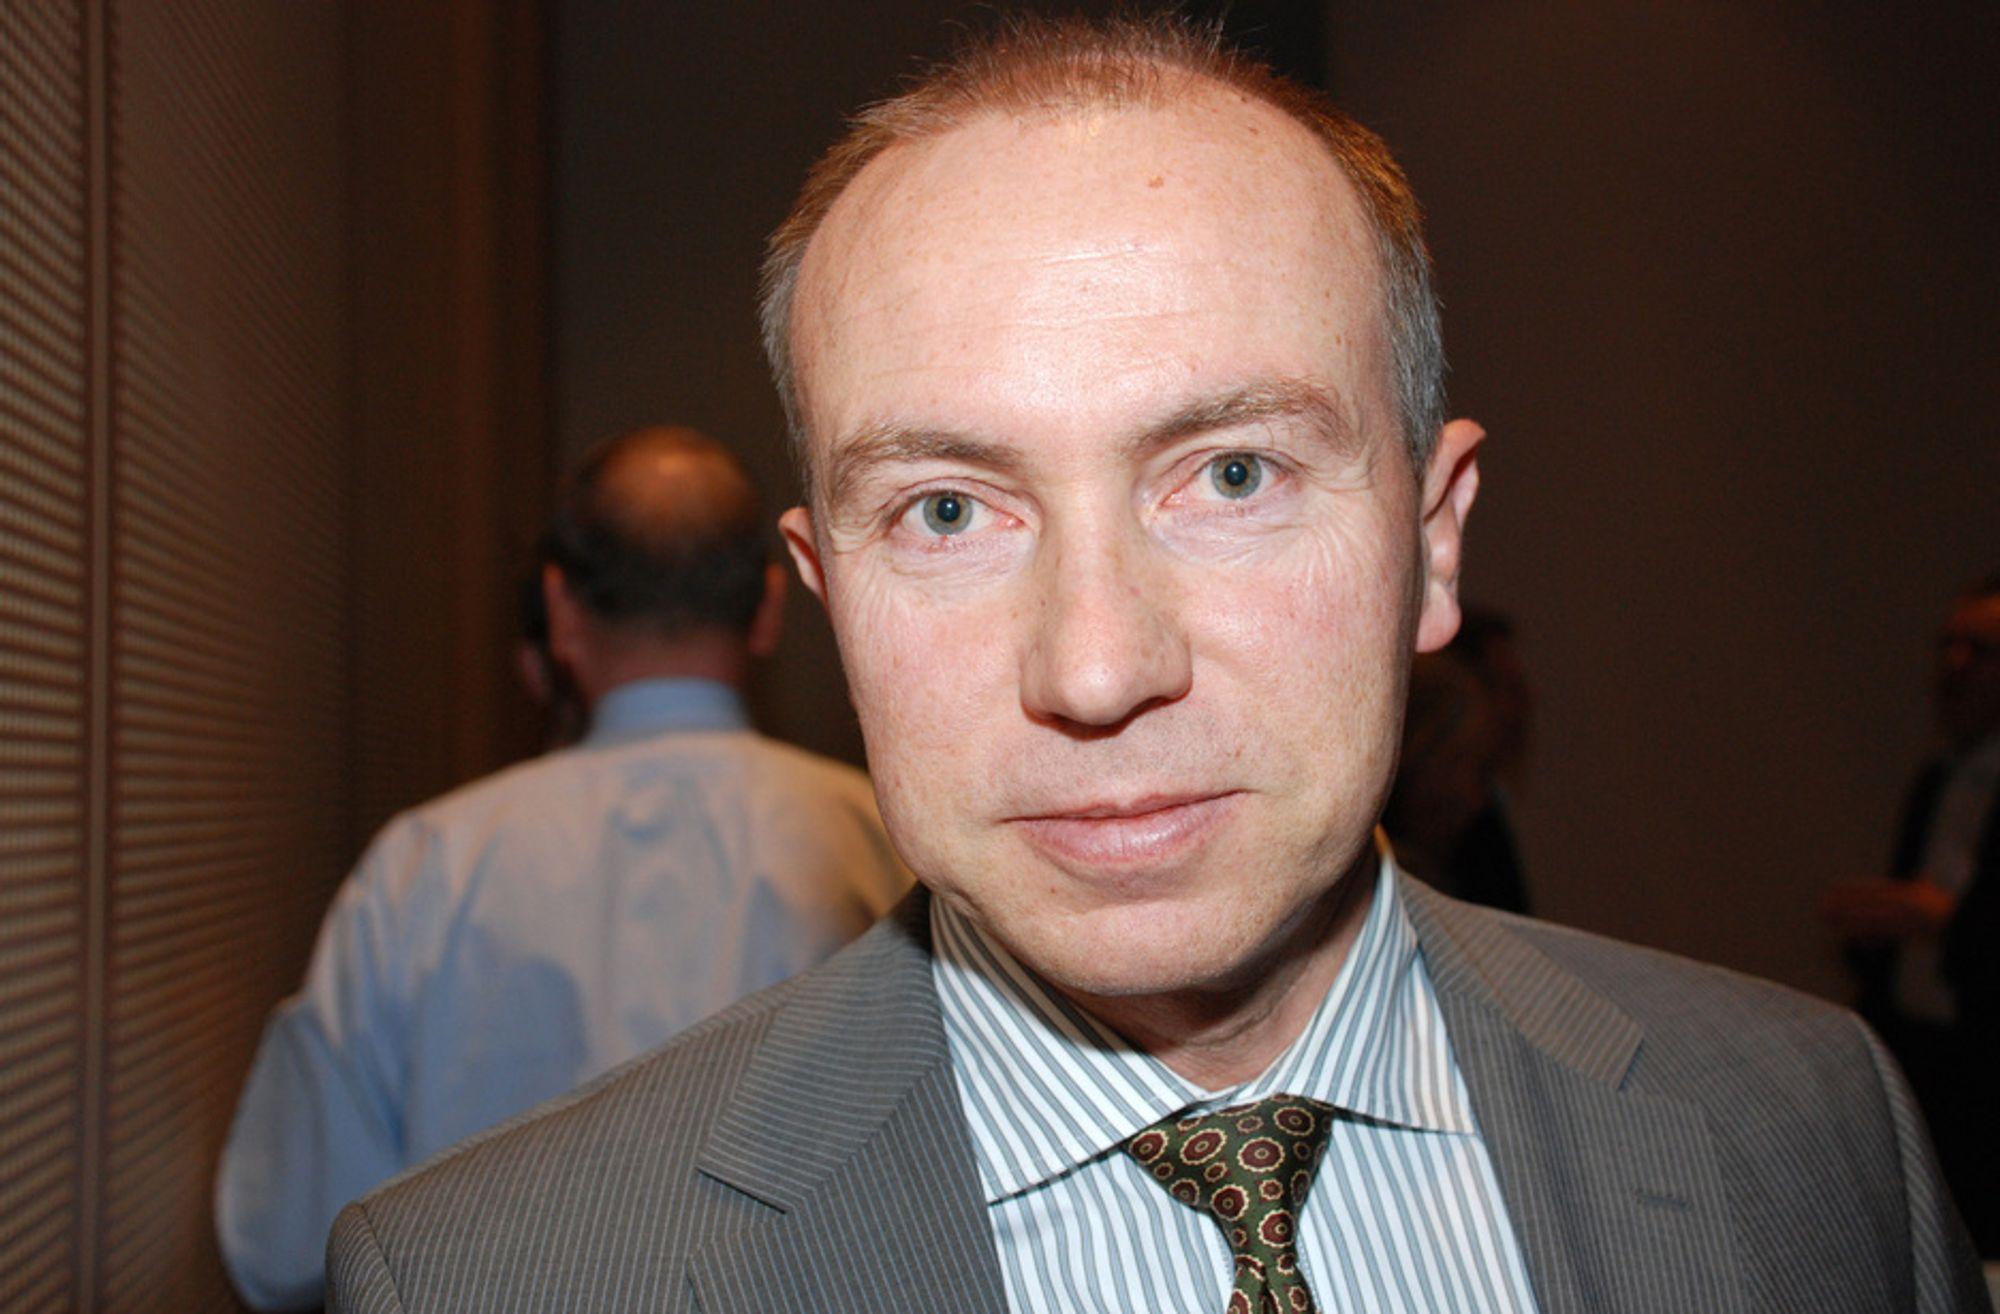 Konsernsjef Christian Rynning-Tønnesen i Norske Skog.